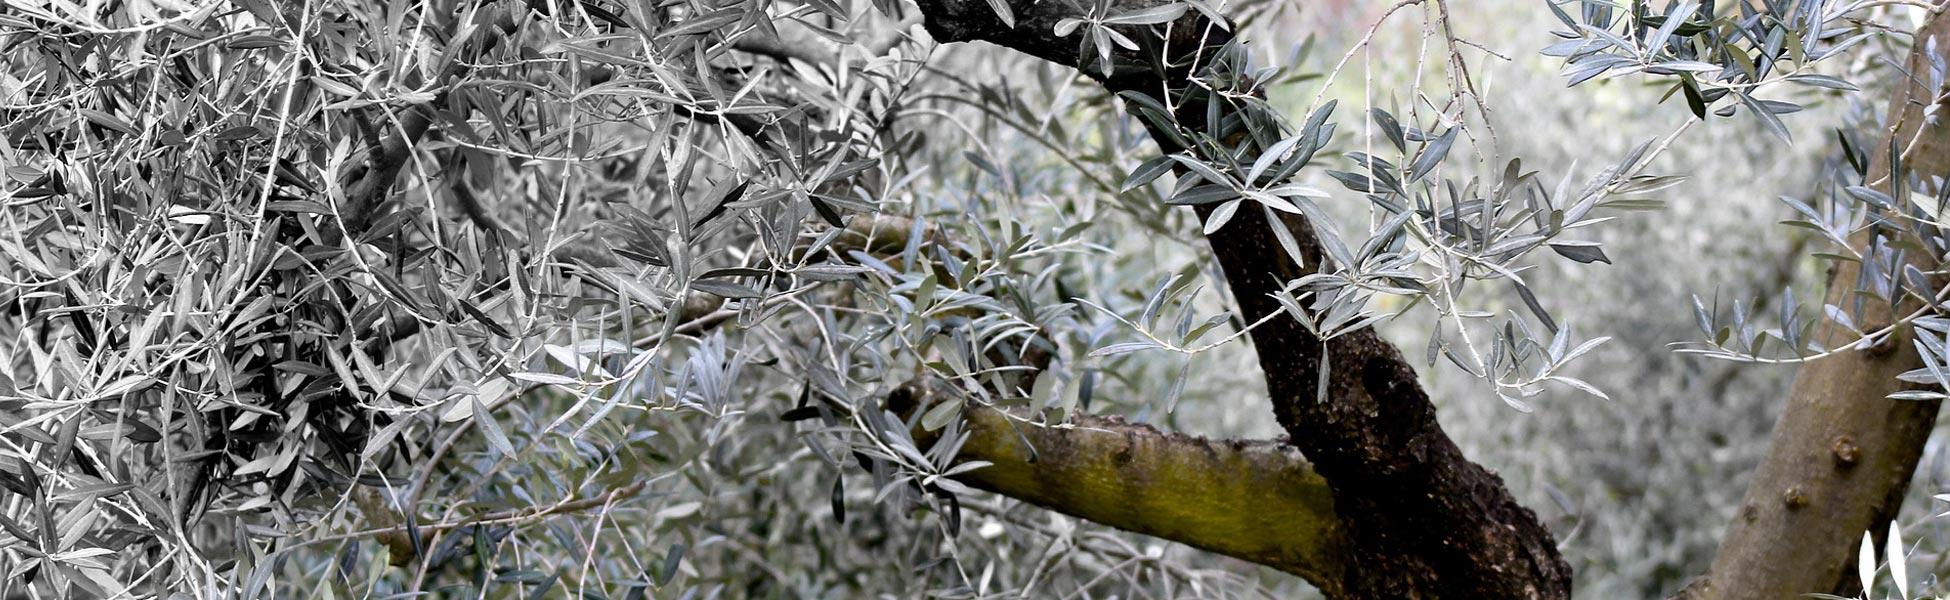 historia-olivo